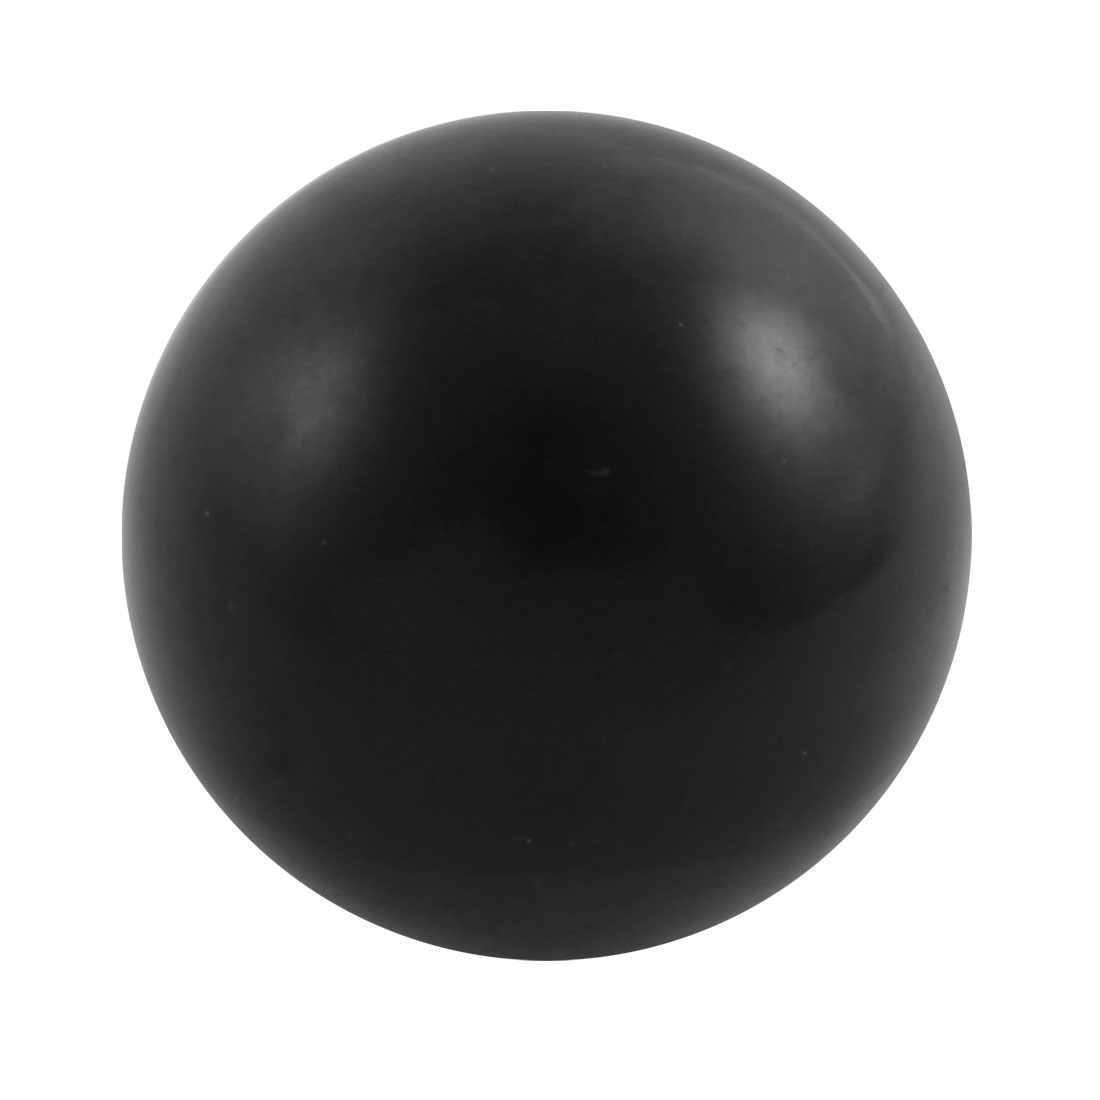 M16 x 40mm Female Thread Round 50mm Diameter Ball Lever Knob Black